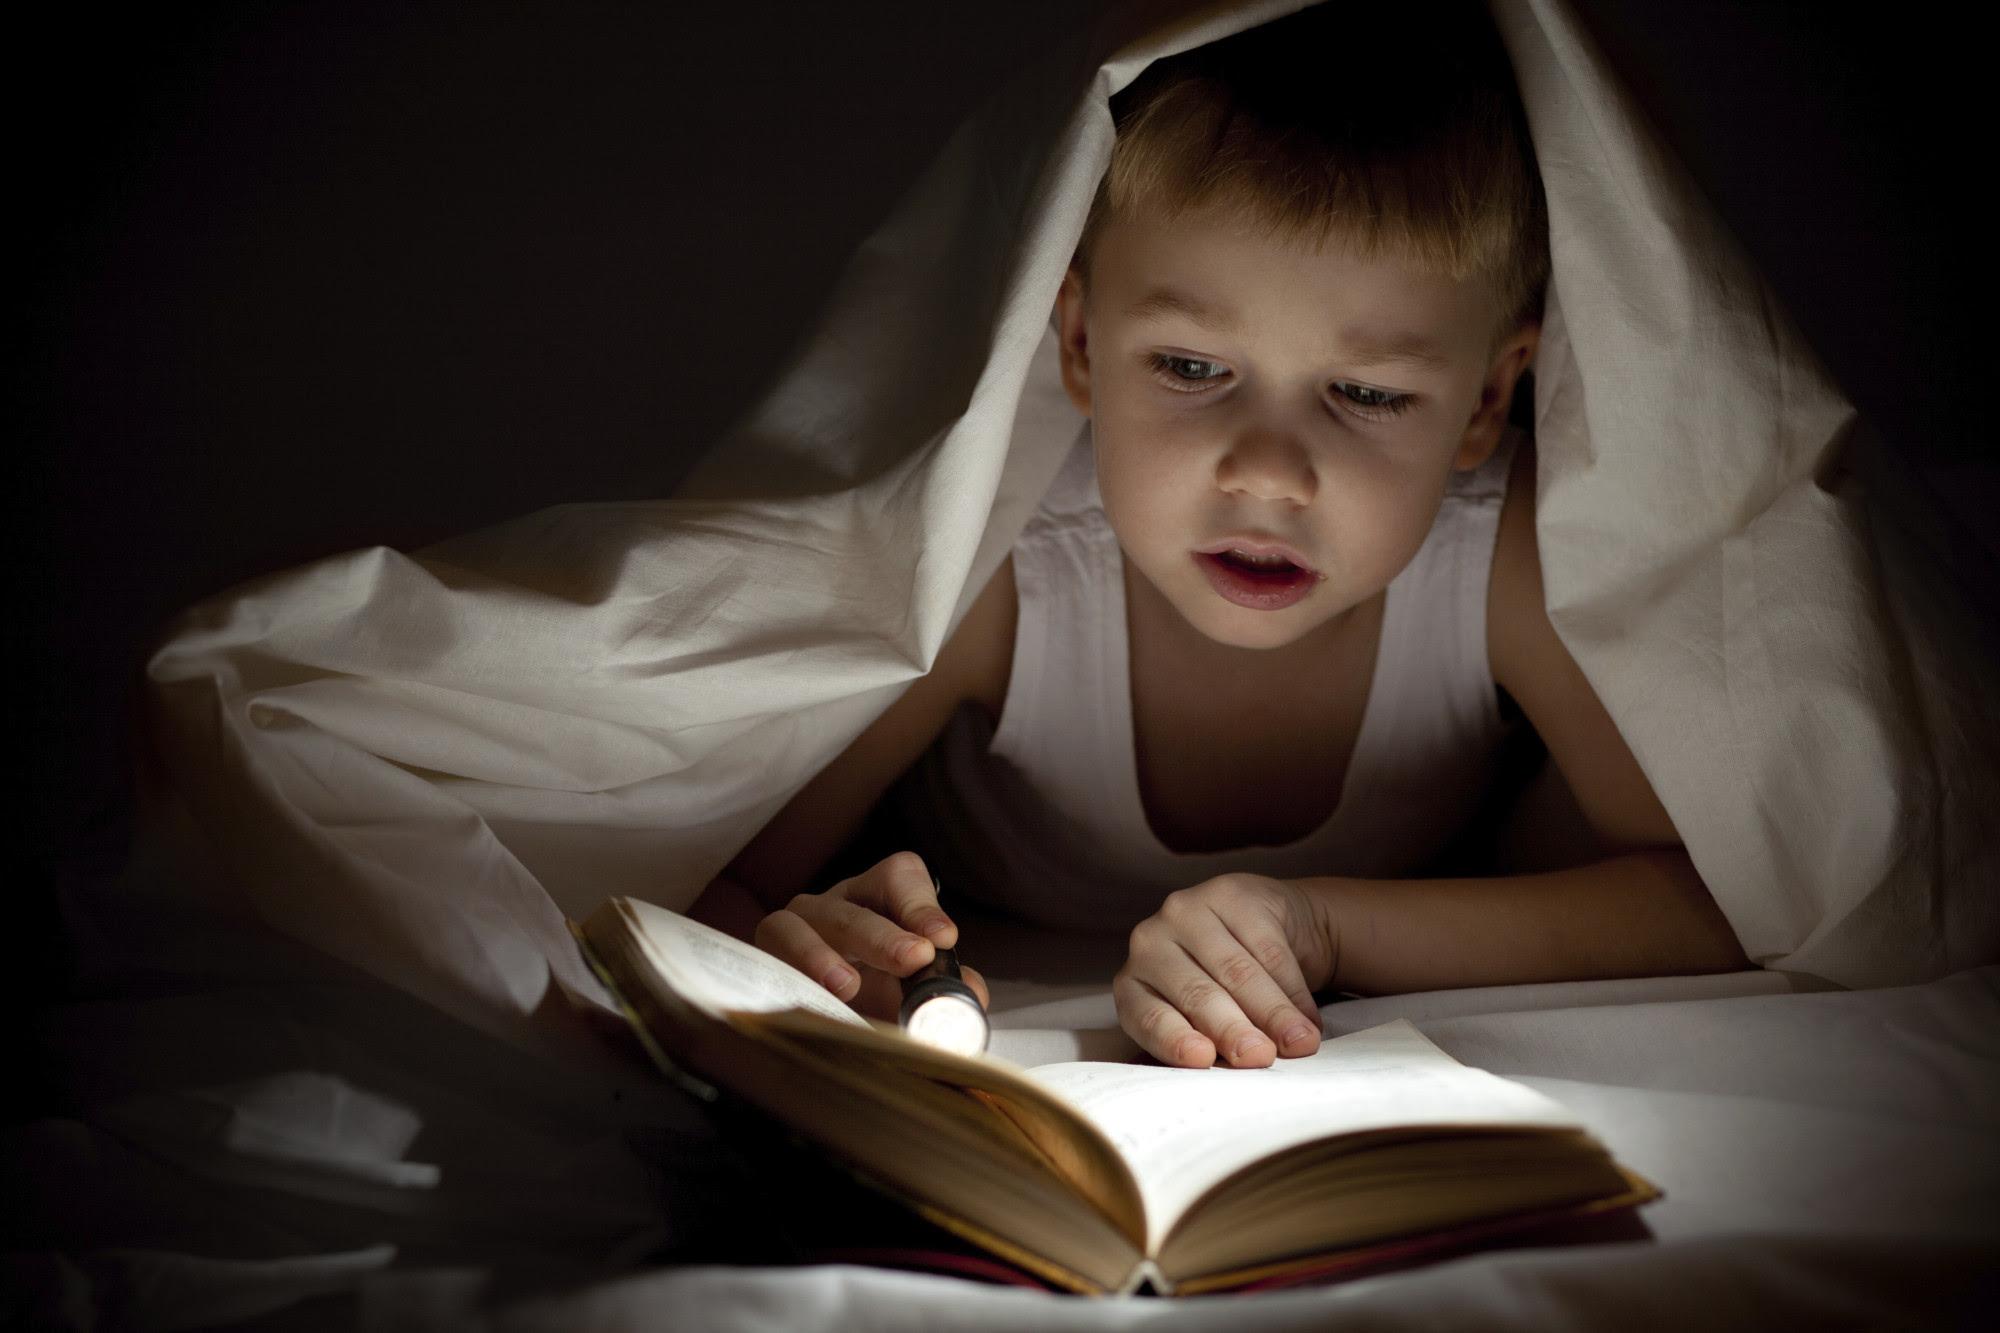 Znalezione obrazy dla zapytania child reading